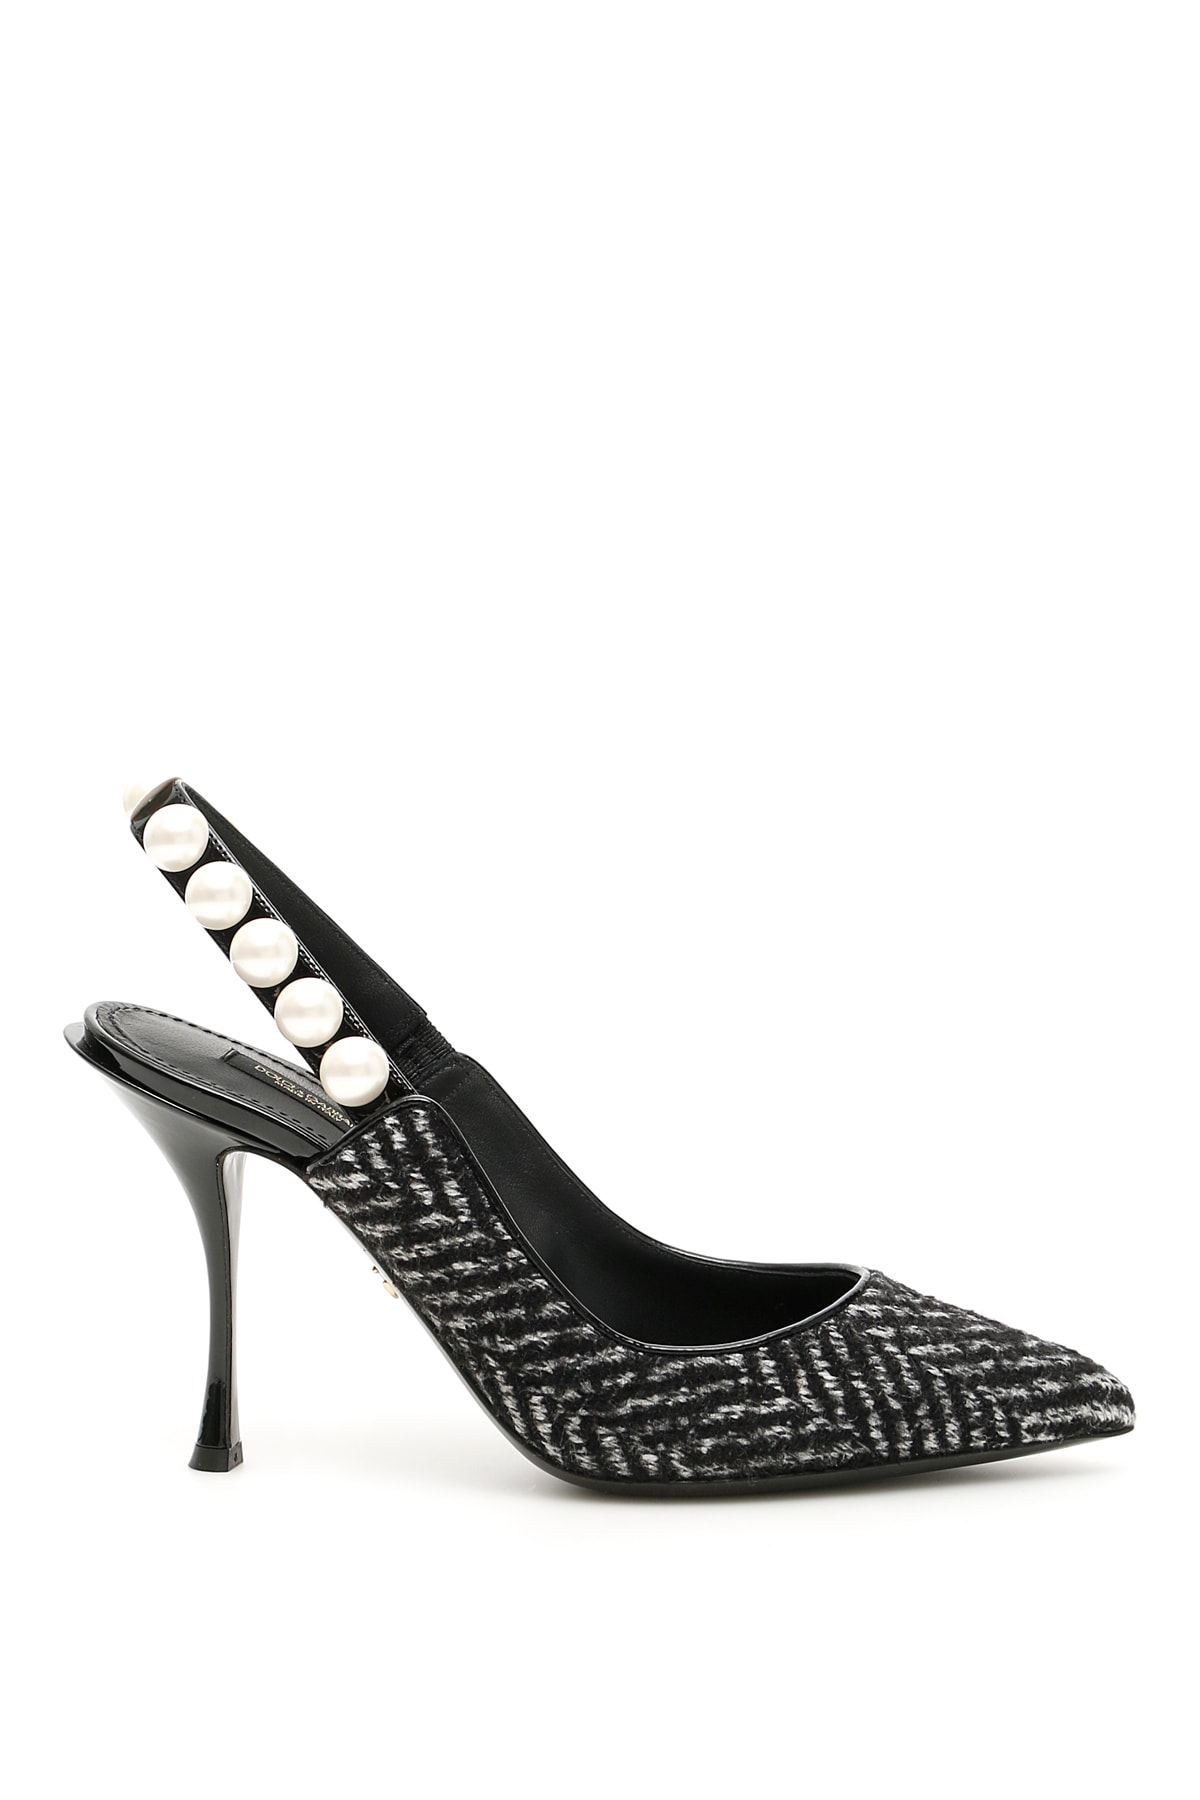 Dolce & Gabbana Lori Chevron Slingbacks With Pearls